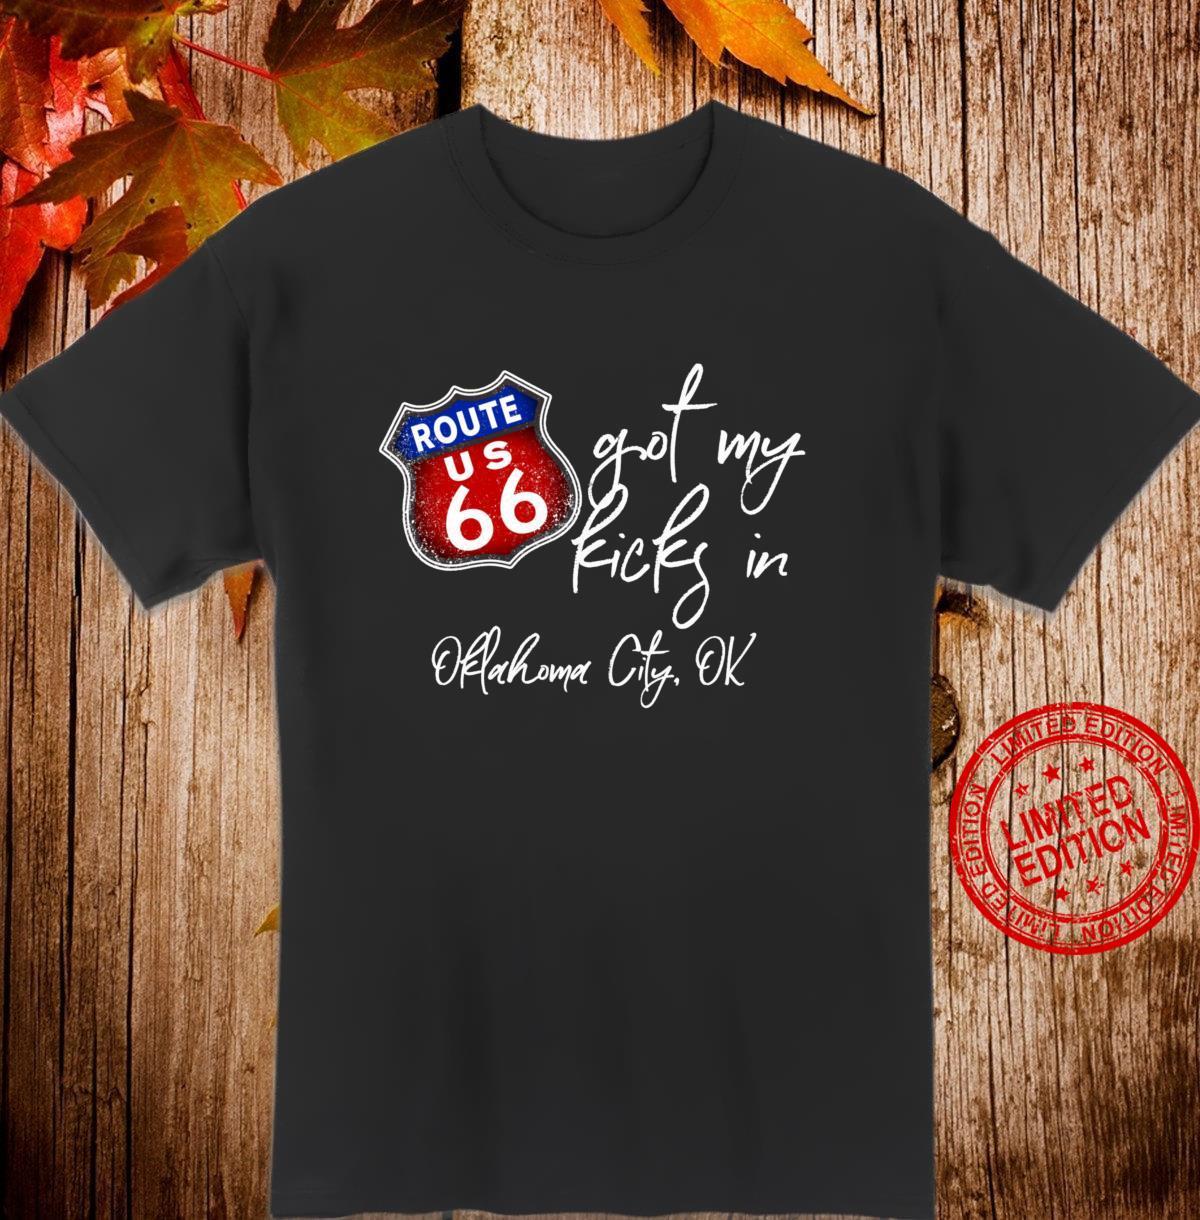 Route 66 Got My Kicks In Oklahoma City OK Souvenir Shirt